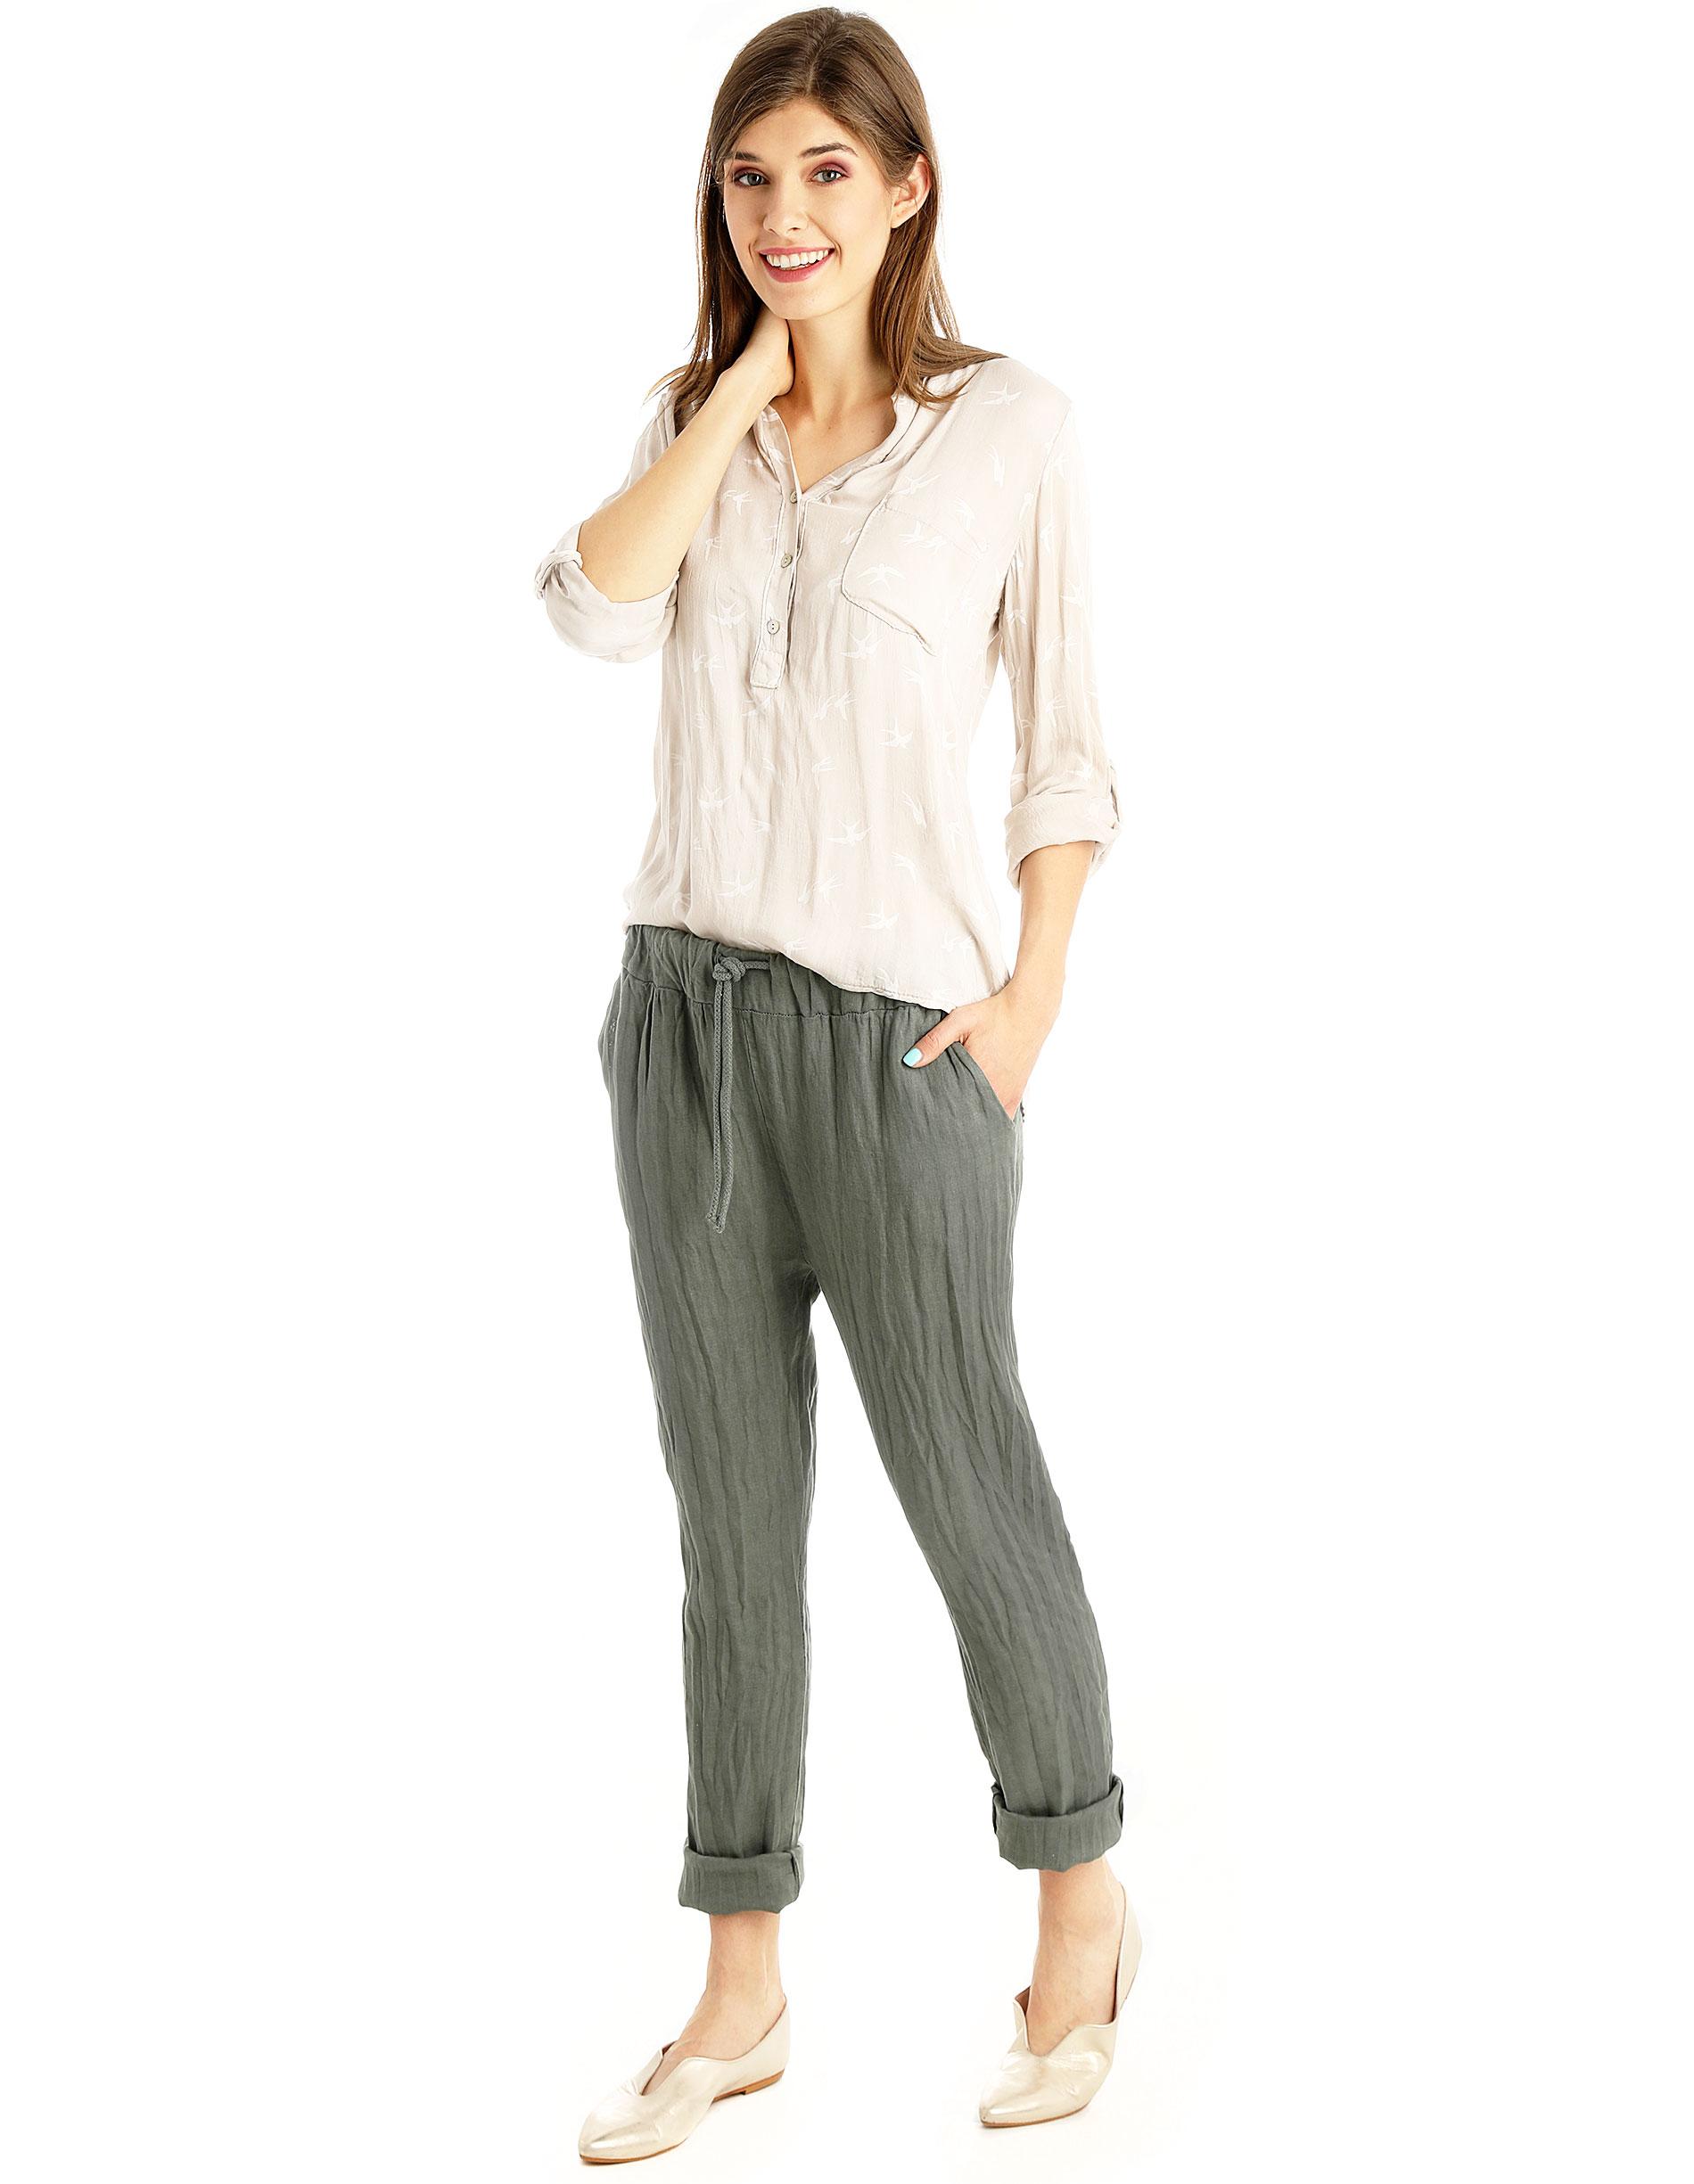 Spodnie - 122-7716 MILI - Unisono